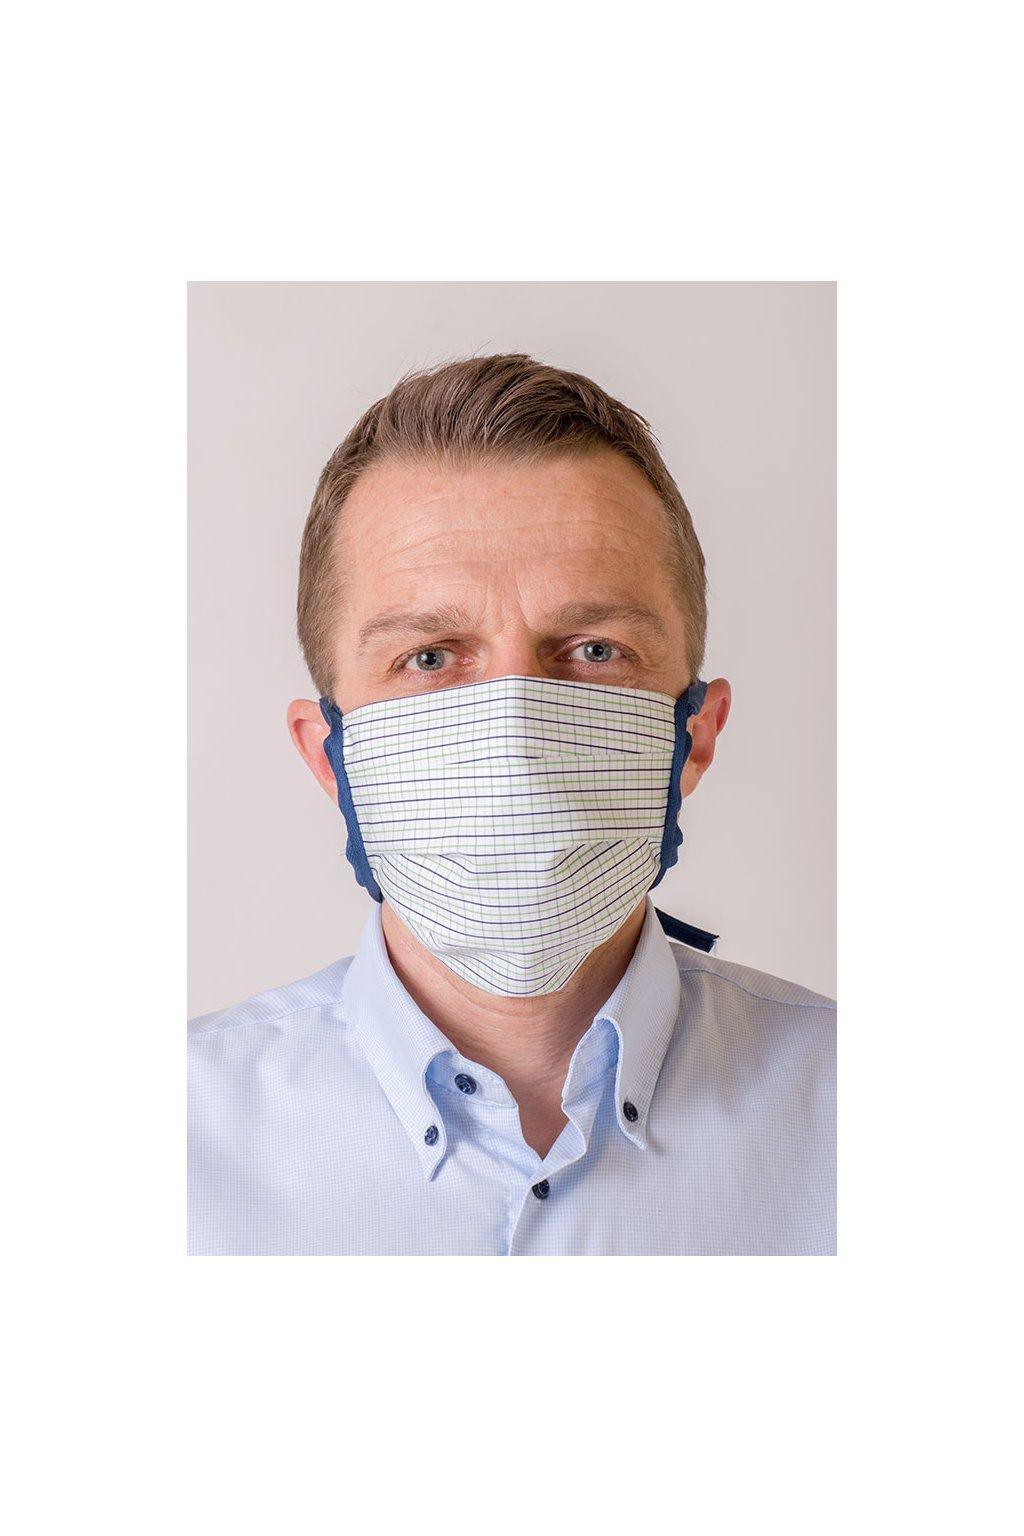 Bavlněná rouška na ústa a nos dvouvrstvá skládaná s kapsou, se šňůrami z keprové stuhy, 797-202, Bílá/modrá